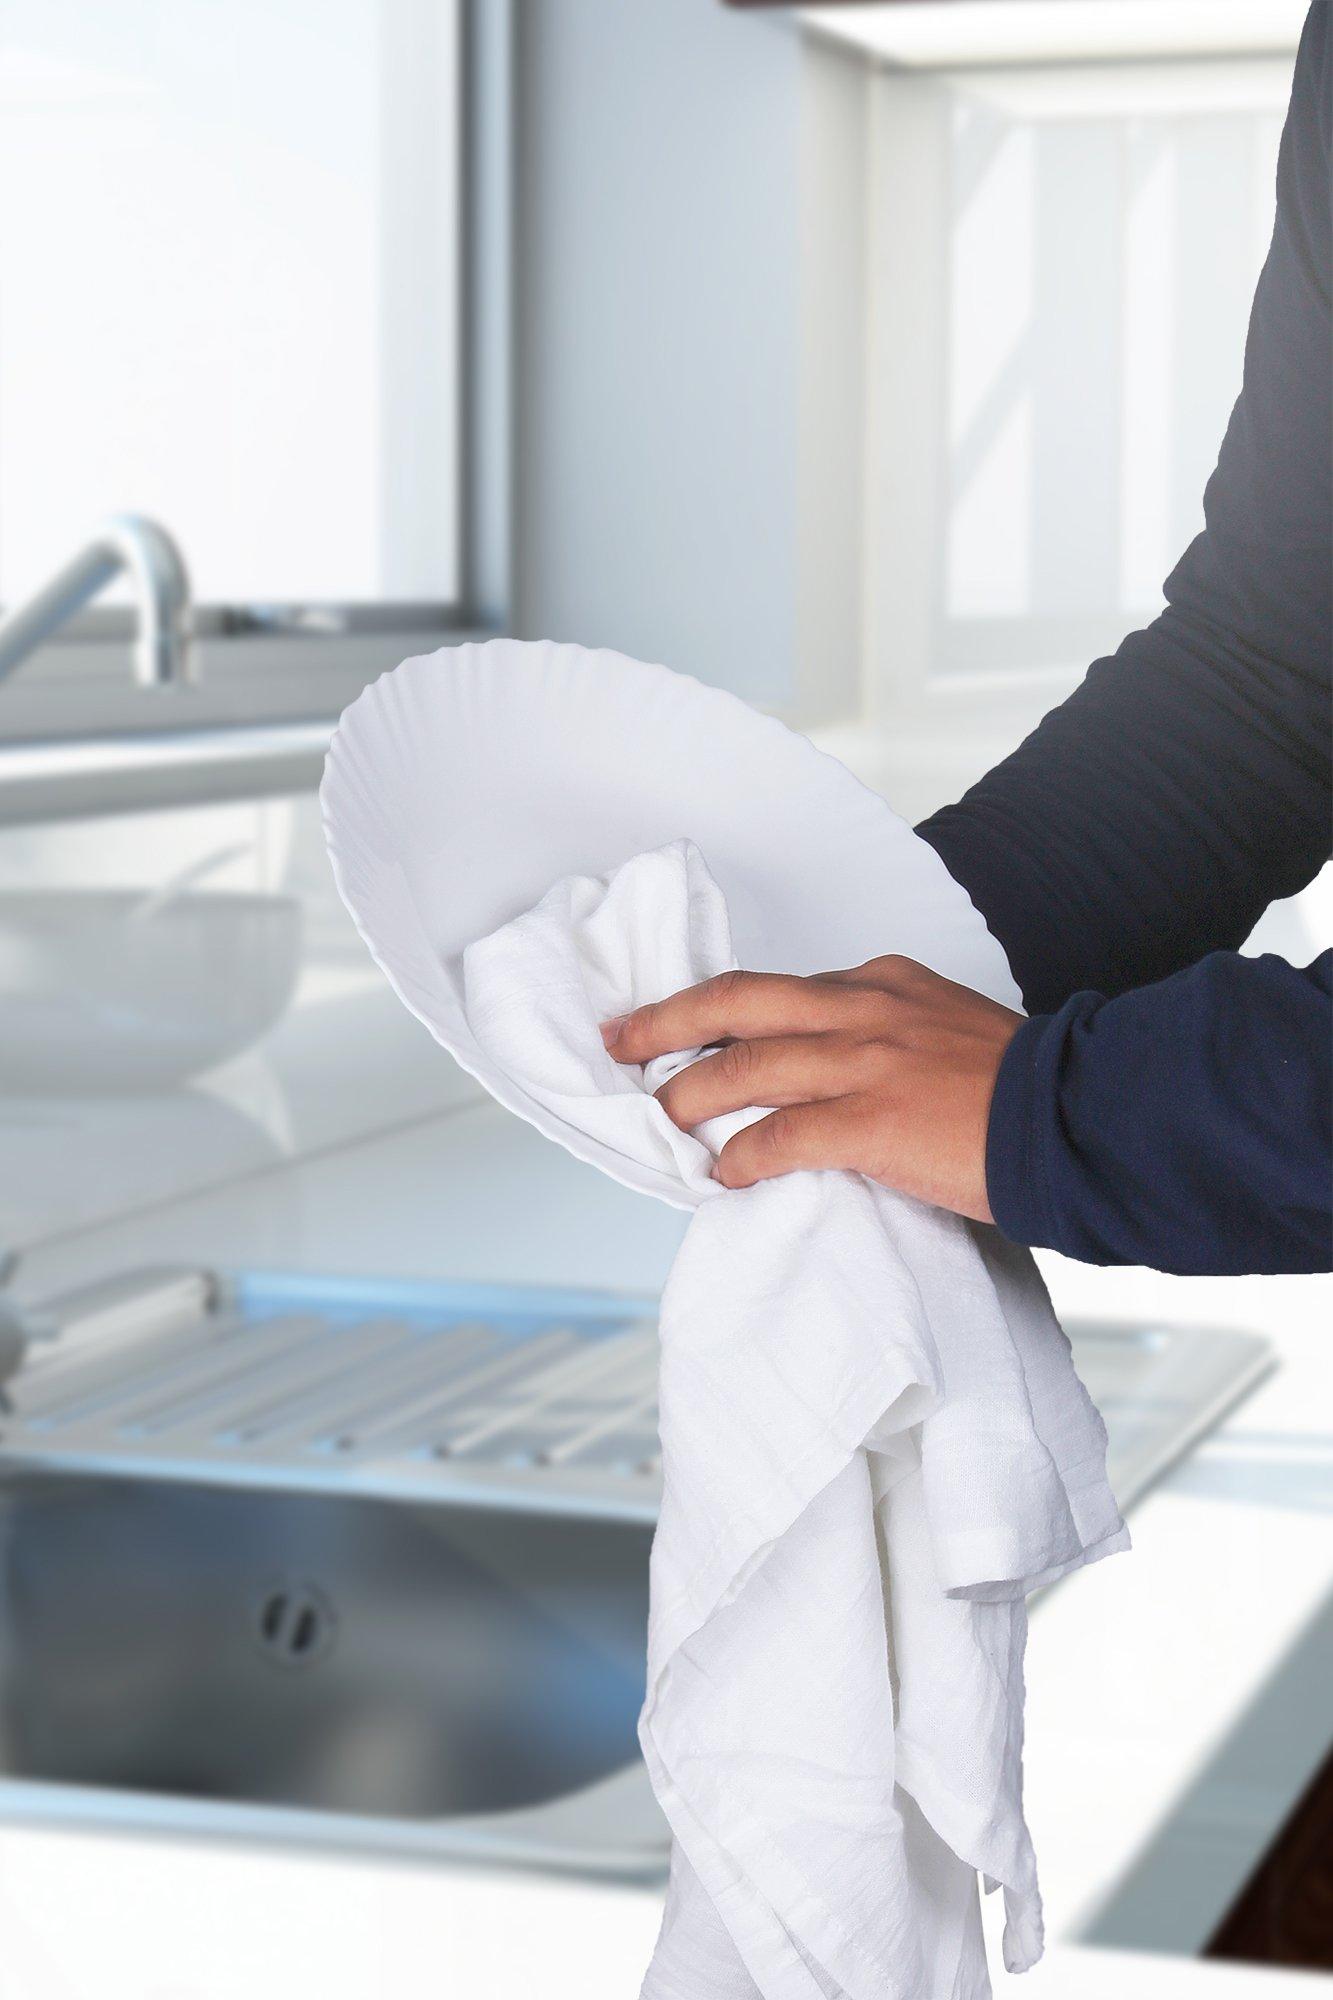 Utopia Kitchen 12 Pack Flour Sack Dish Towels - 100% Pure Ring Spun Cotton Kitchen Towels by Utopia Kitchen (Image #6)